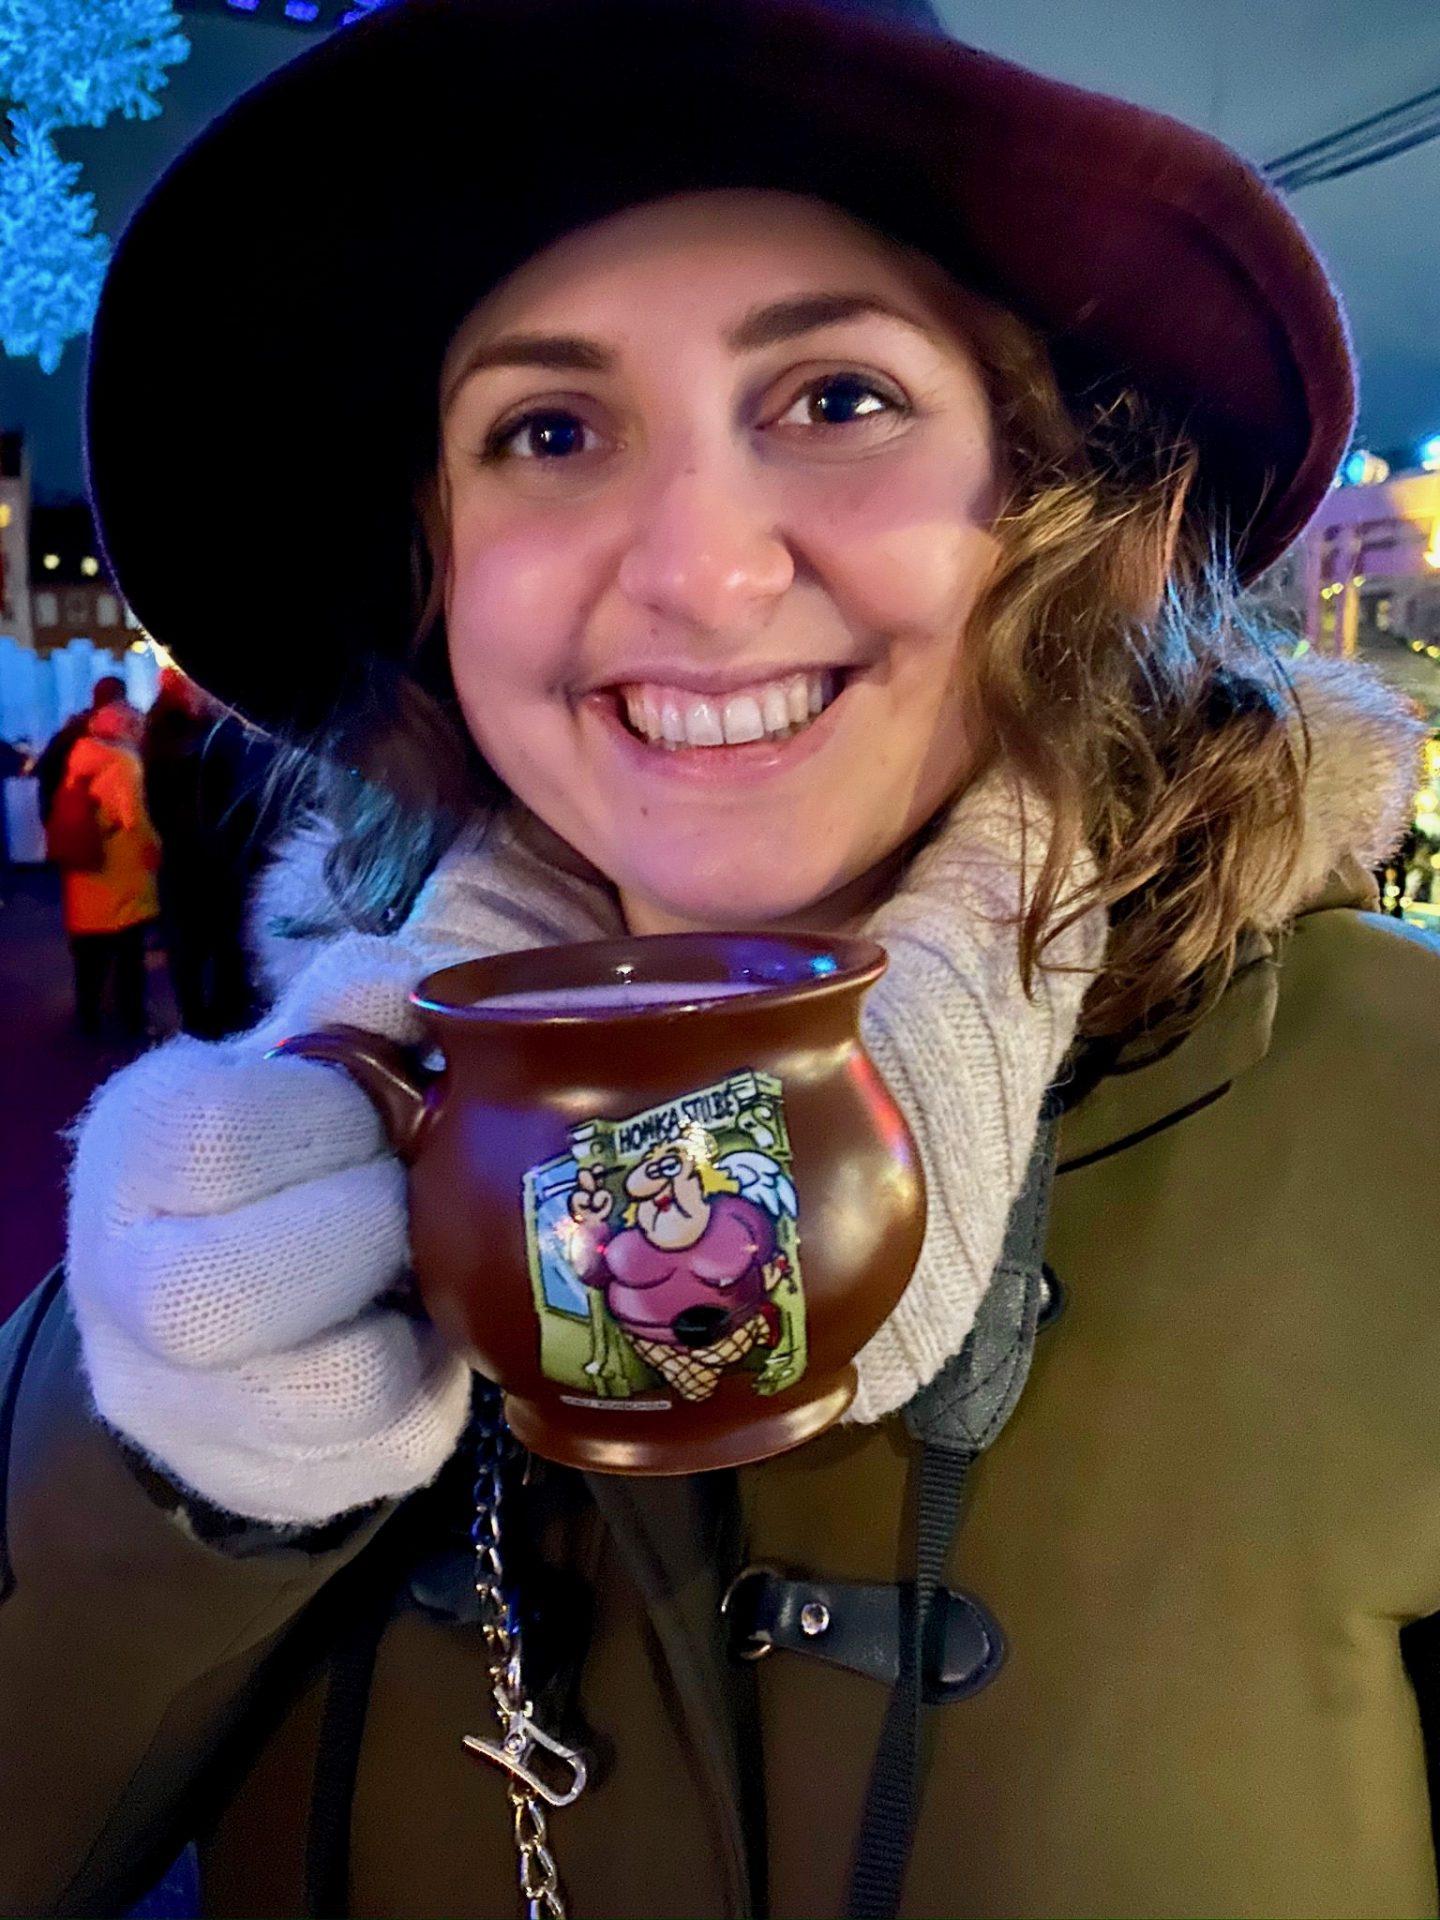 Nell holding a mug of mulled wine and smiling at the camera at the Santa Pauli Christmas market in Hamburg